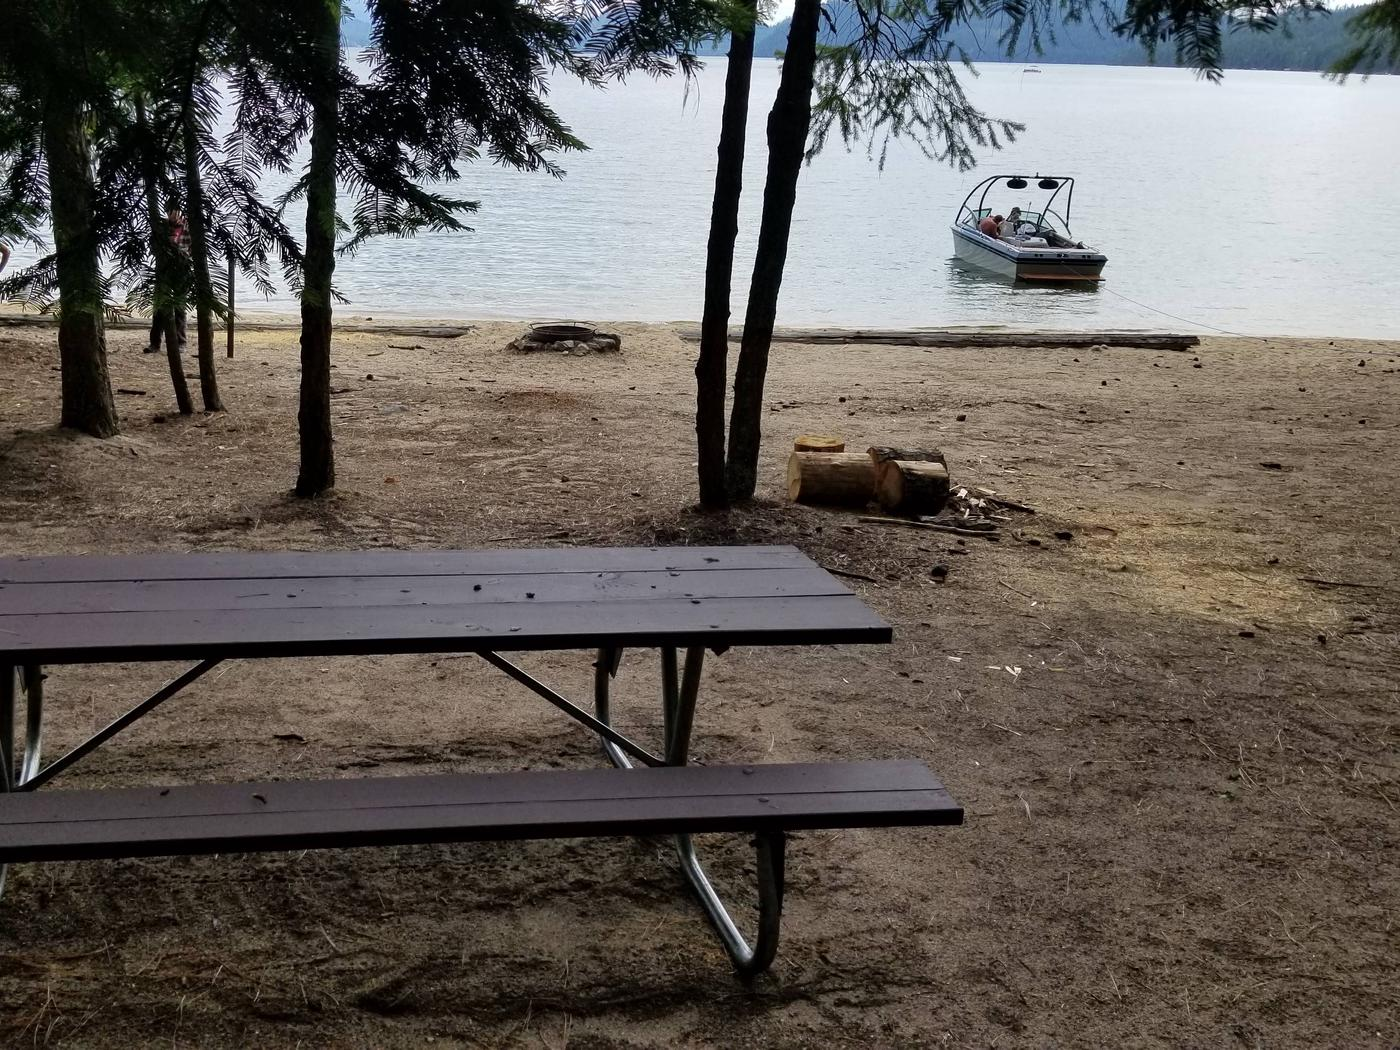 South Bartoo Site #10South Bartoo Boat-in Campsite #10